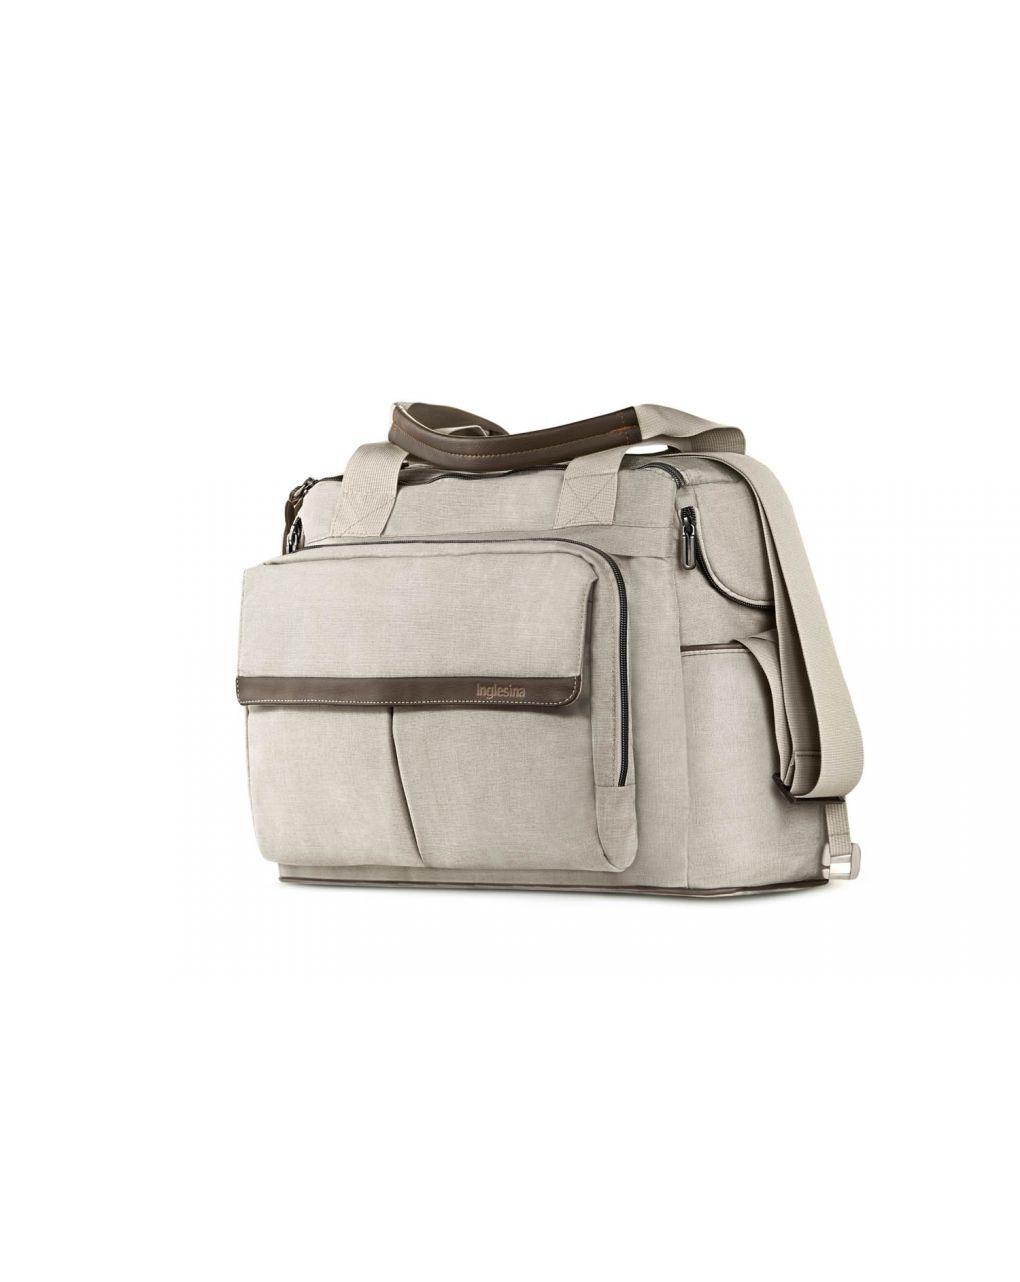 Inglesina aptica dual bag, cashmere beige - Inglesina